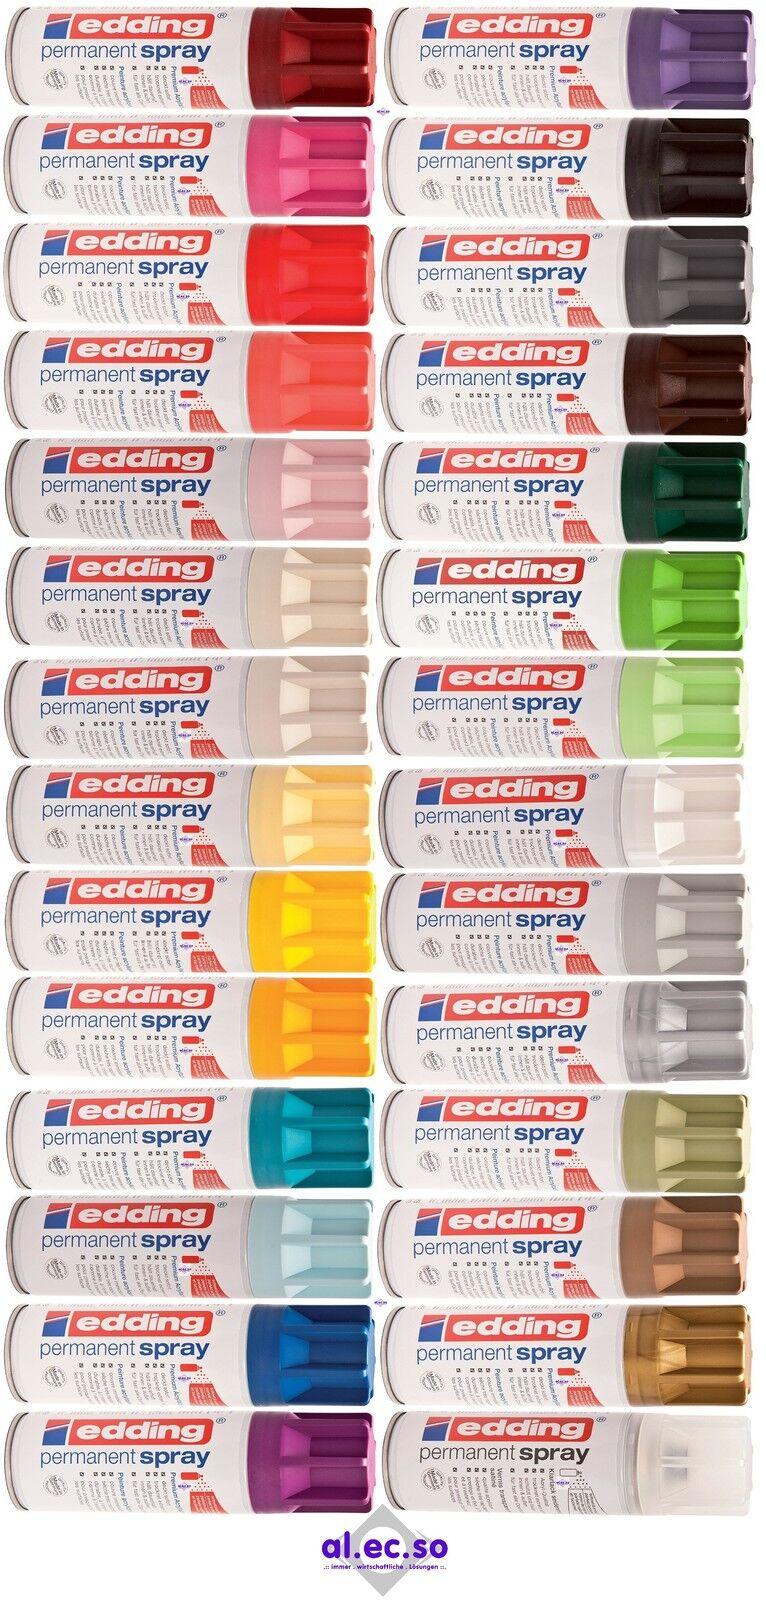 Edding 5200 Edding Spray Permanent Acryllack Permanentspray Grundierung 42Farben